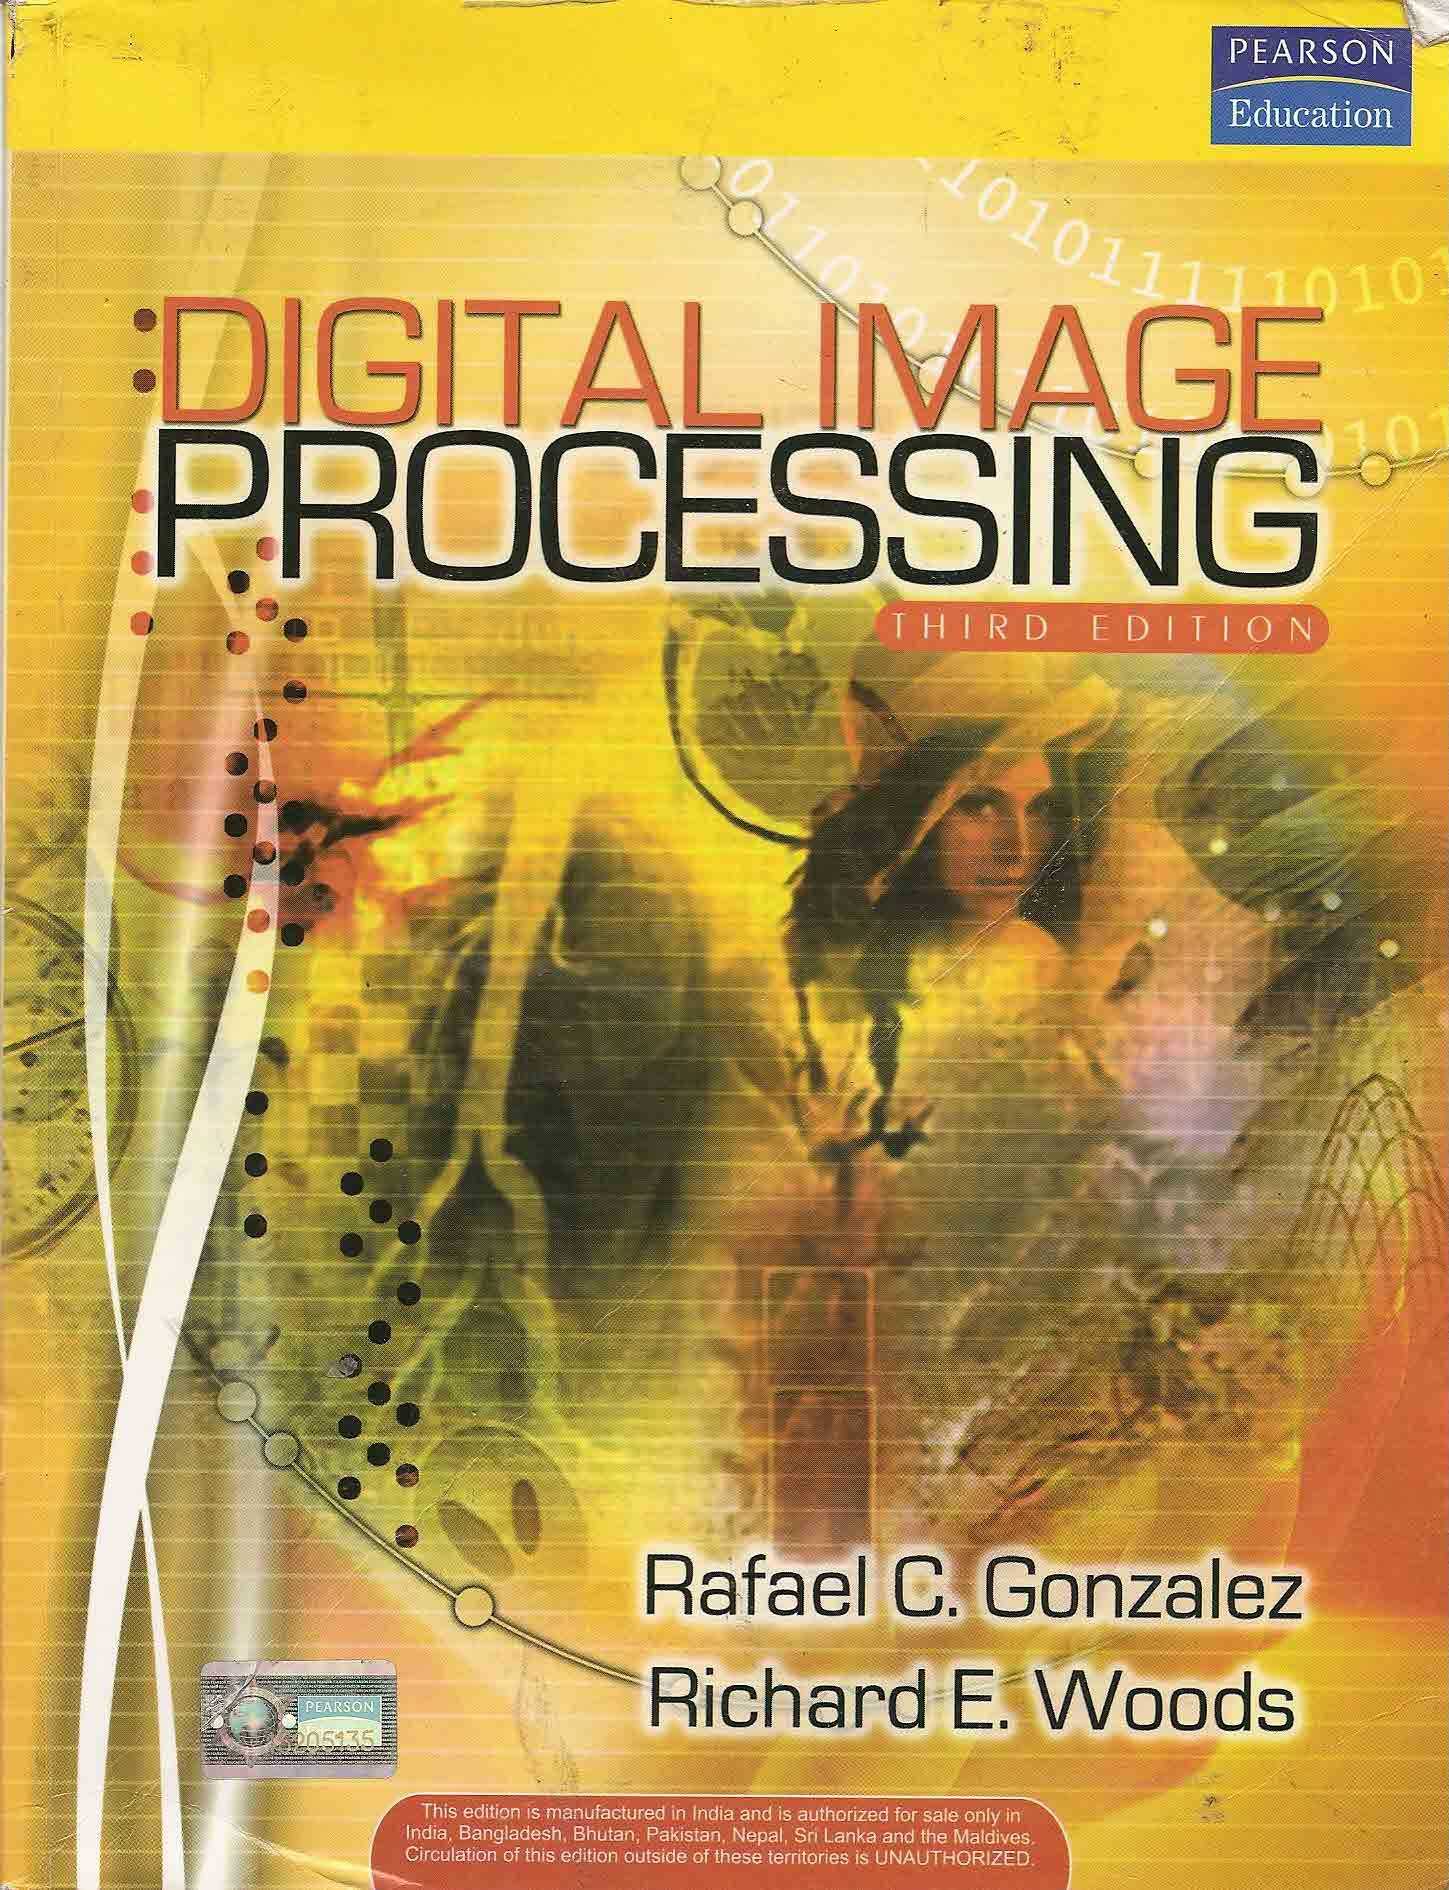 Image Processing Book Gonzalez